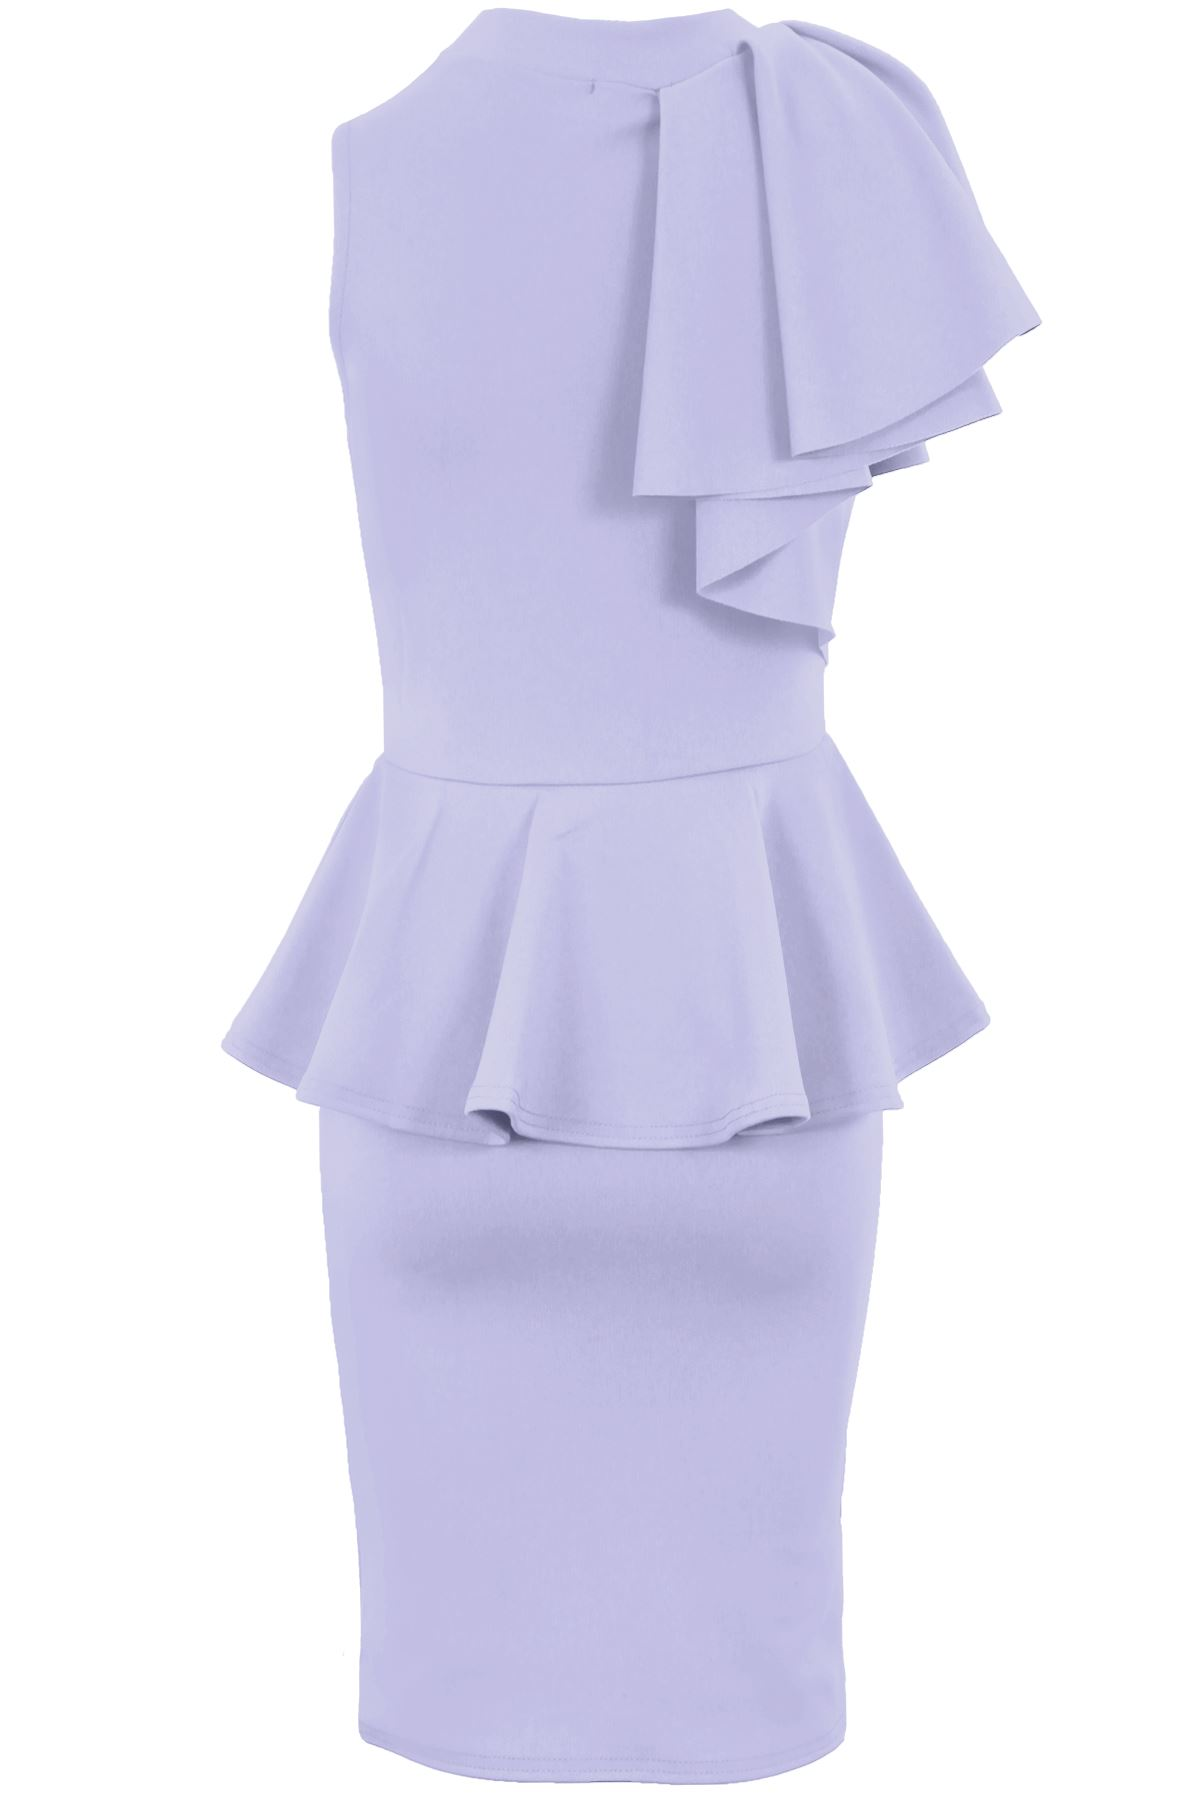 Ladies Sleeveless Ruffle Frill Shoulder Women/'s Peplum Bodycon Party Dress